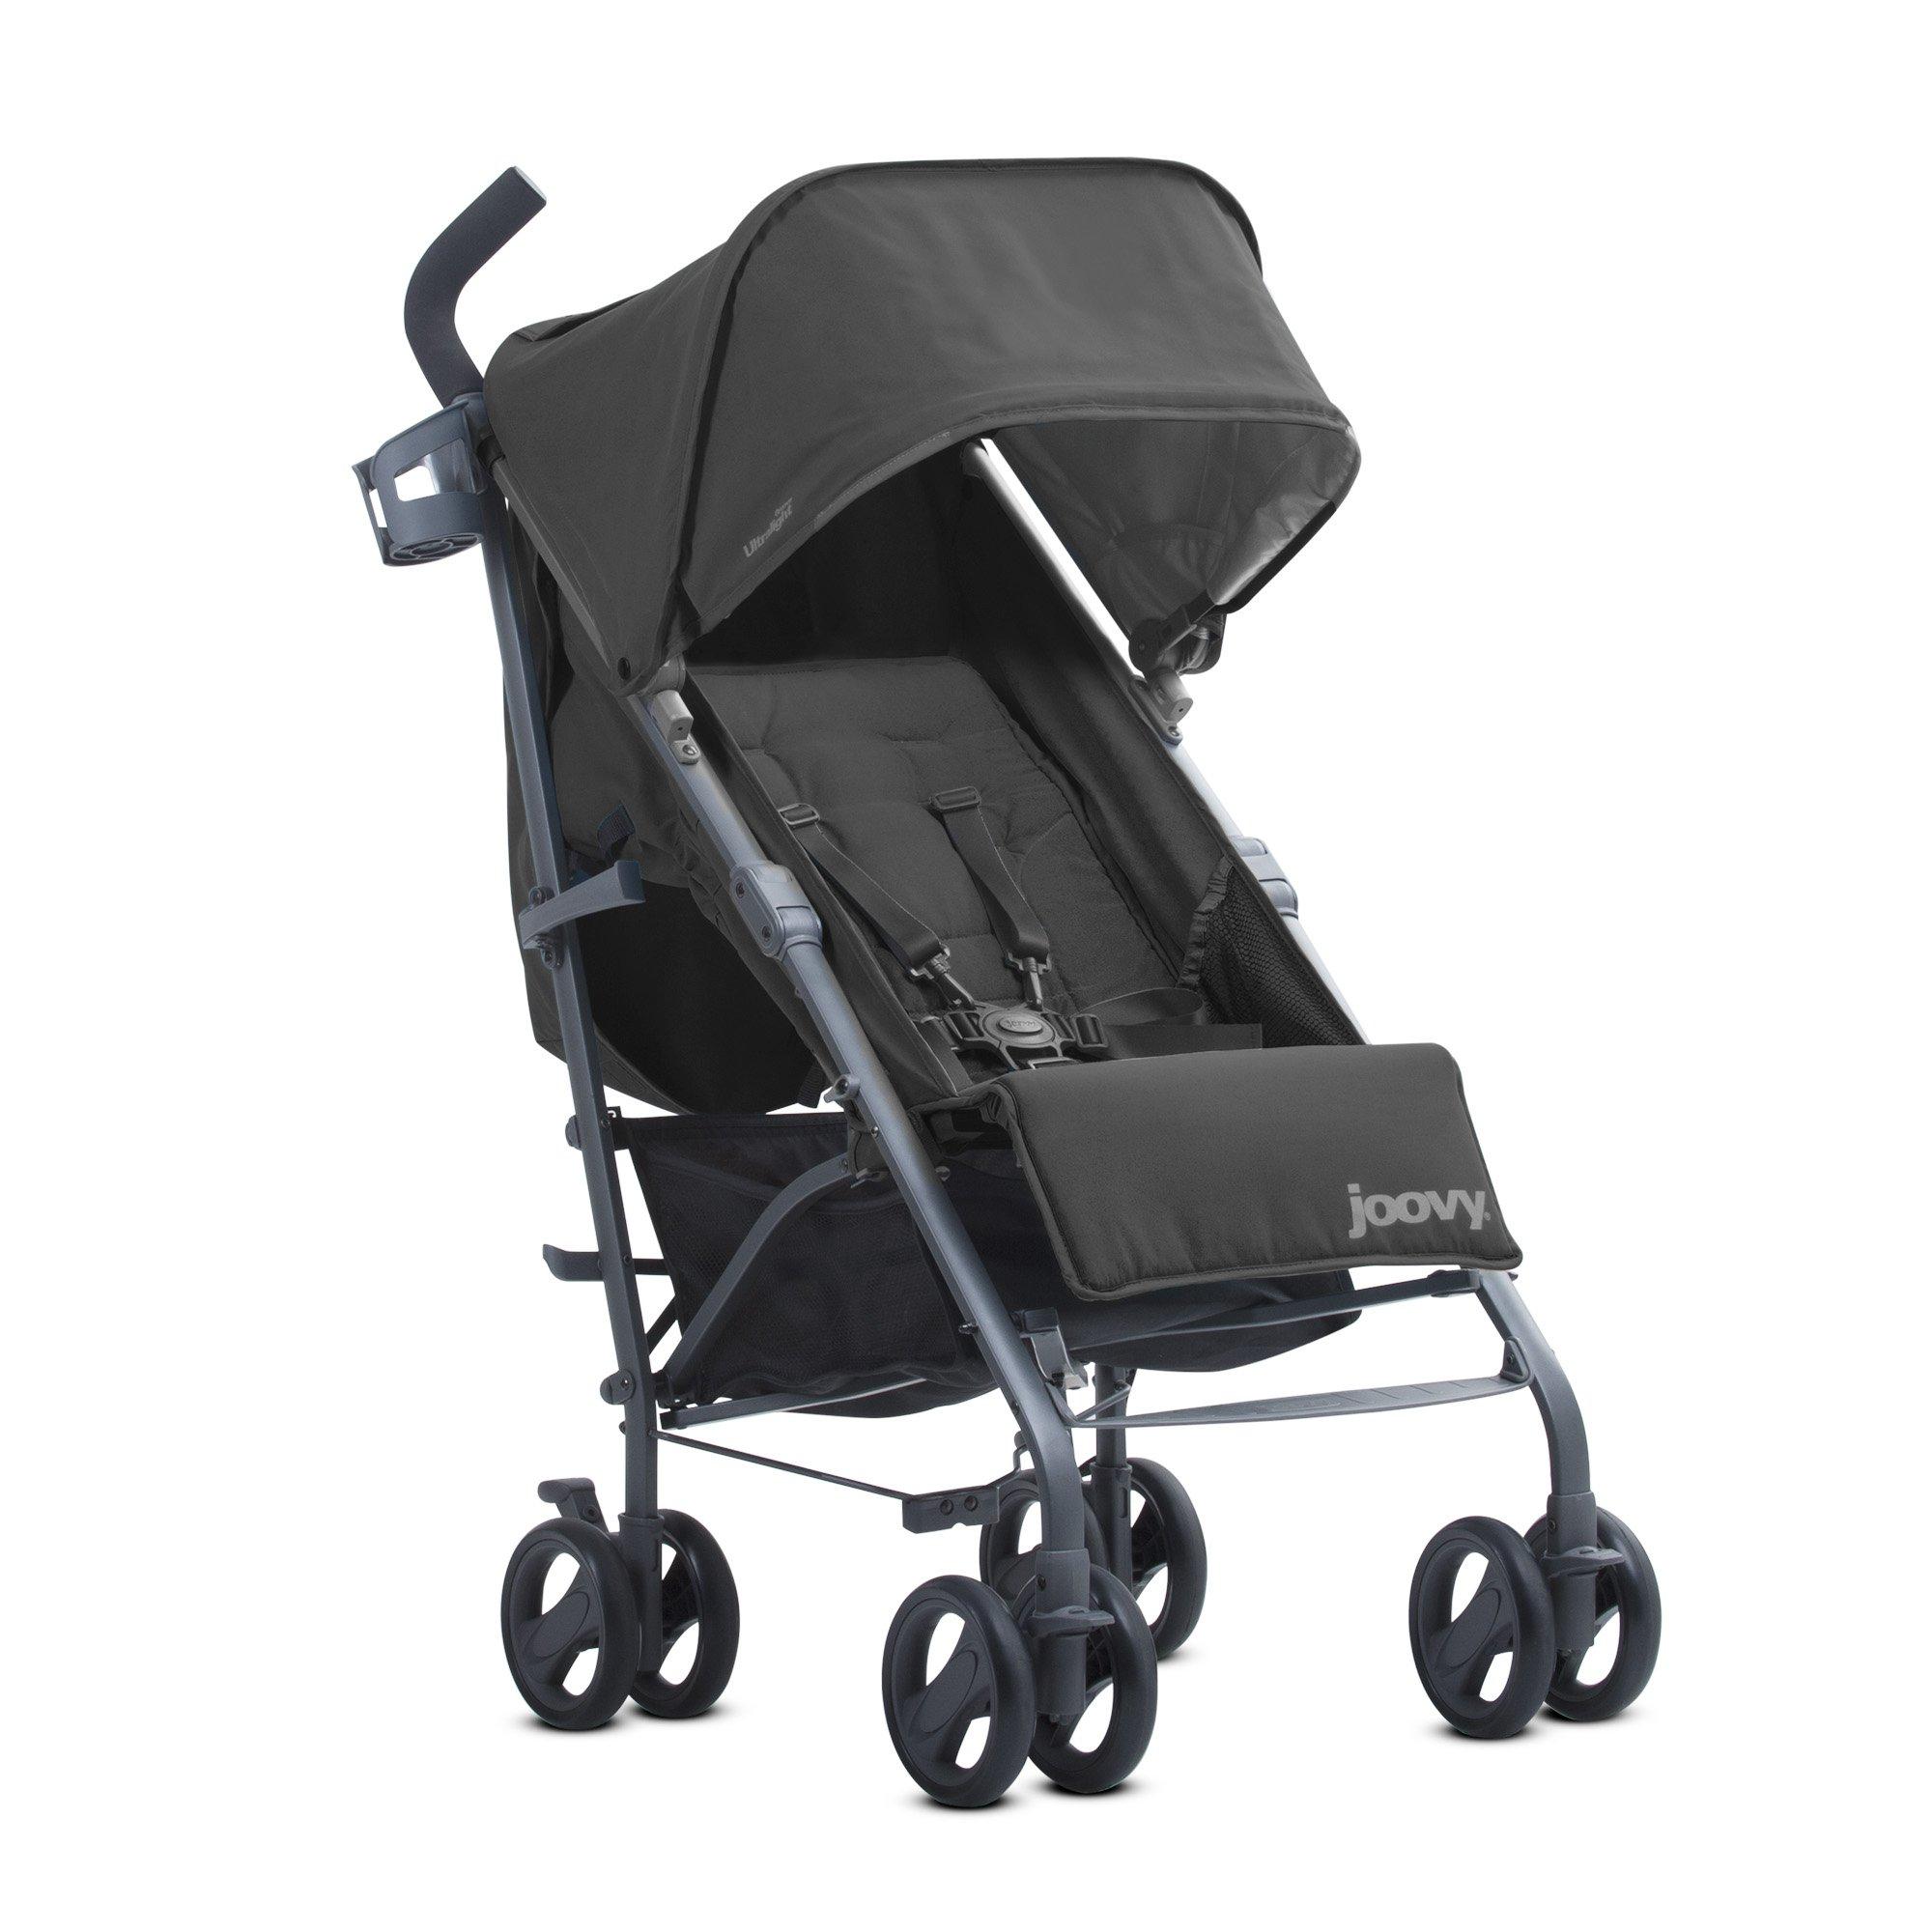 JOOVY New Groove Ultralight Umbrella Stroller, Black